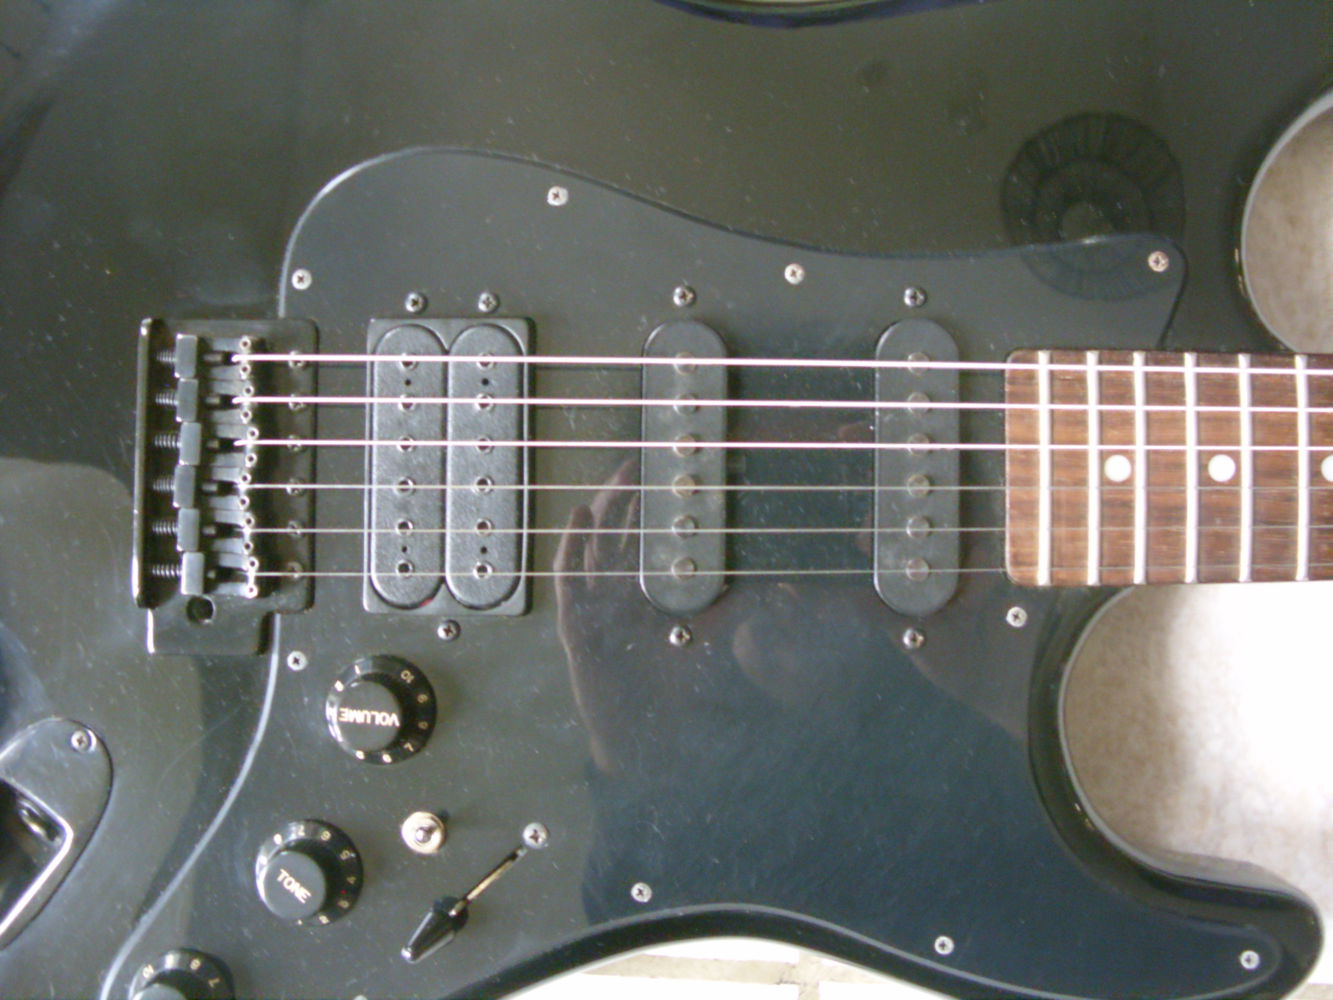 guitare electrique applause